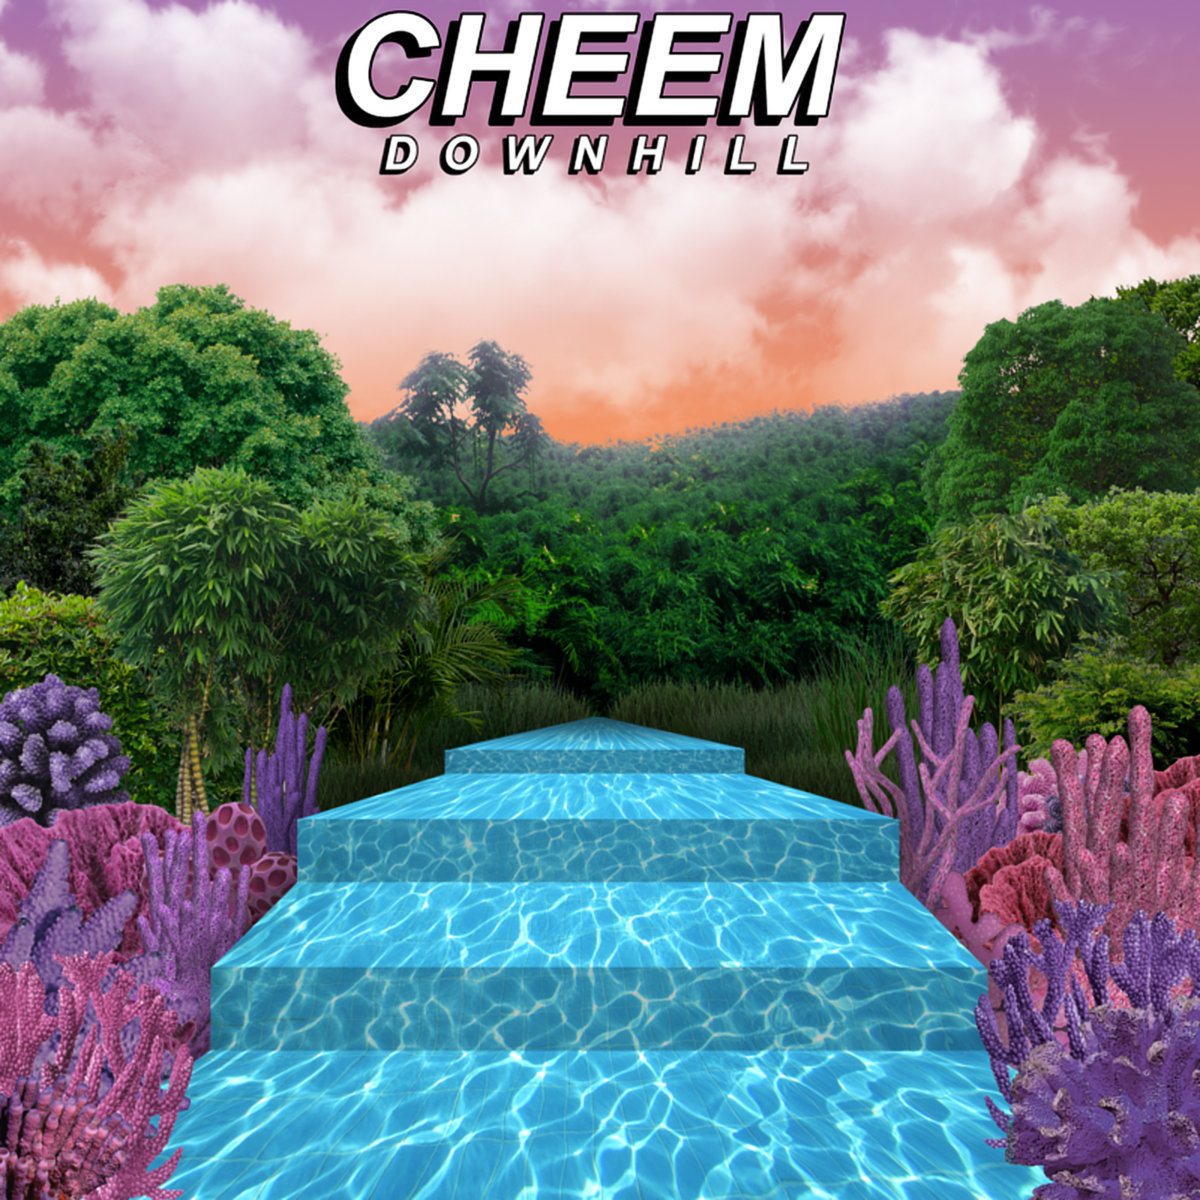 Game Boy Color | Cheem